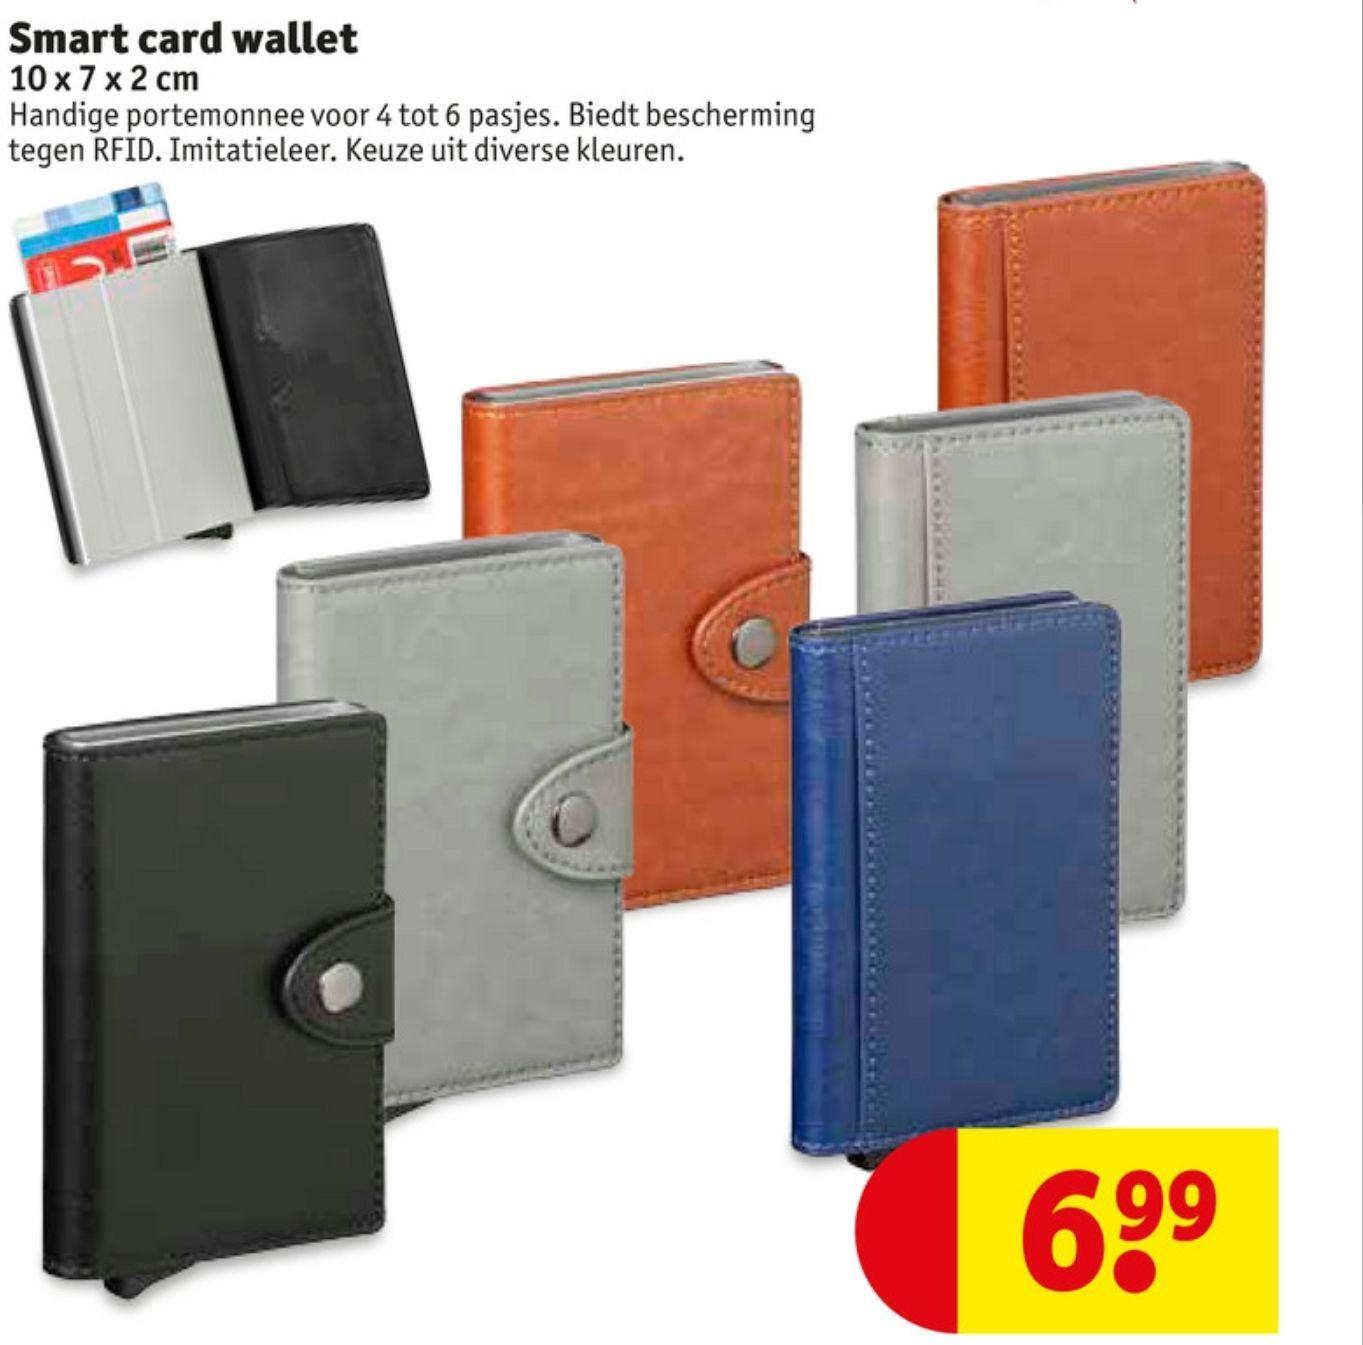 Smart card wallet (kruitvat)